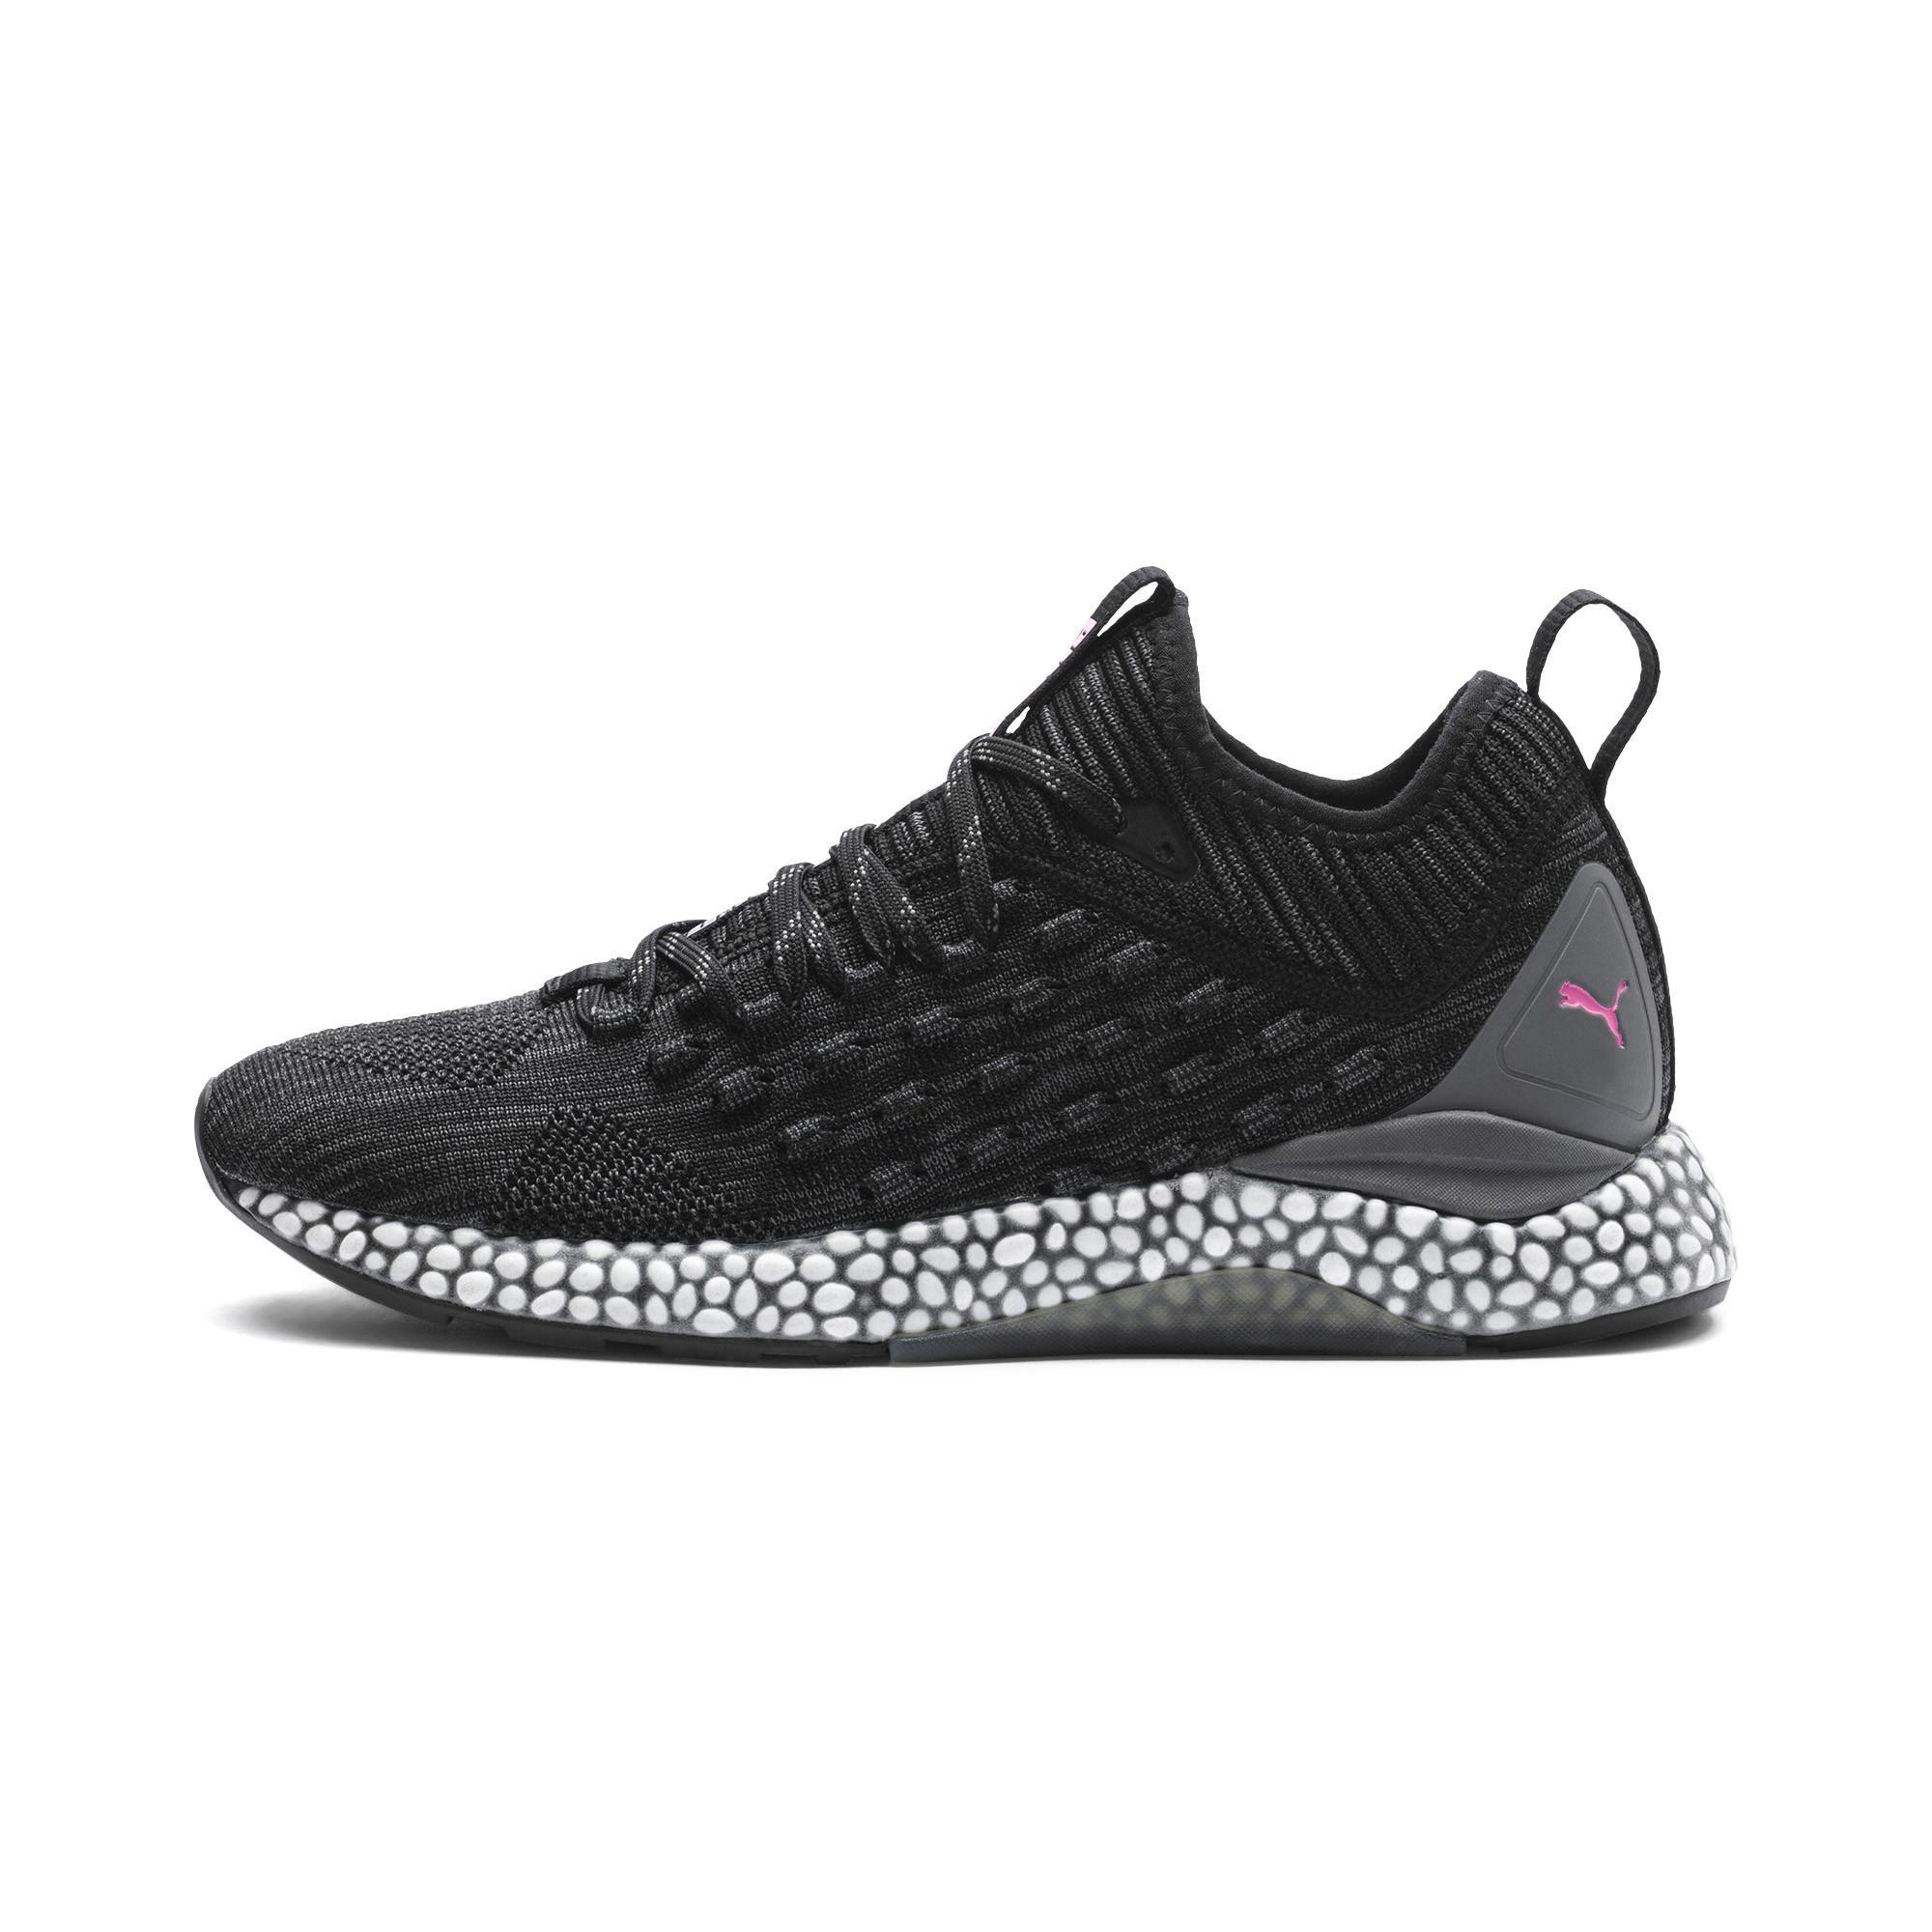 5babbae549c8be Lyst - PUMA Hybrid Runner Fusefit Women s Running Shoes in Black ...